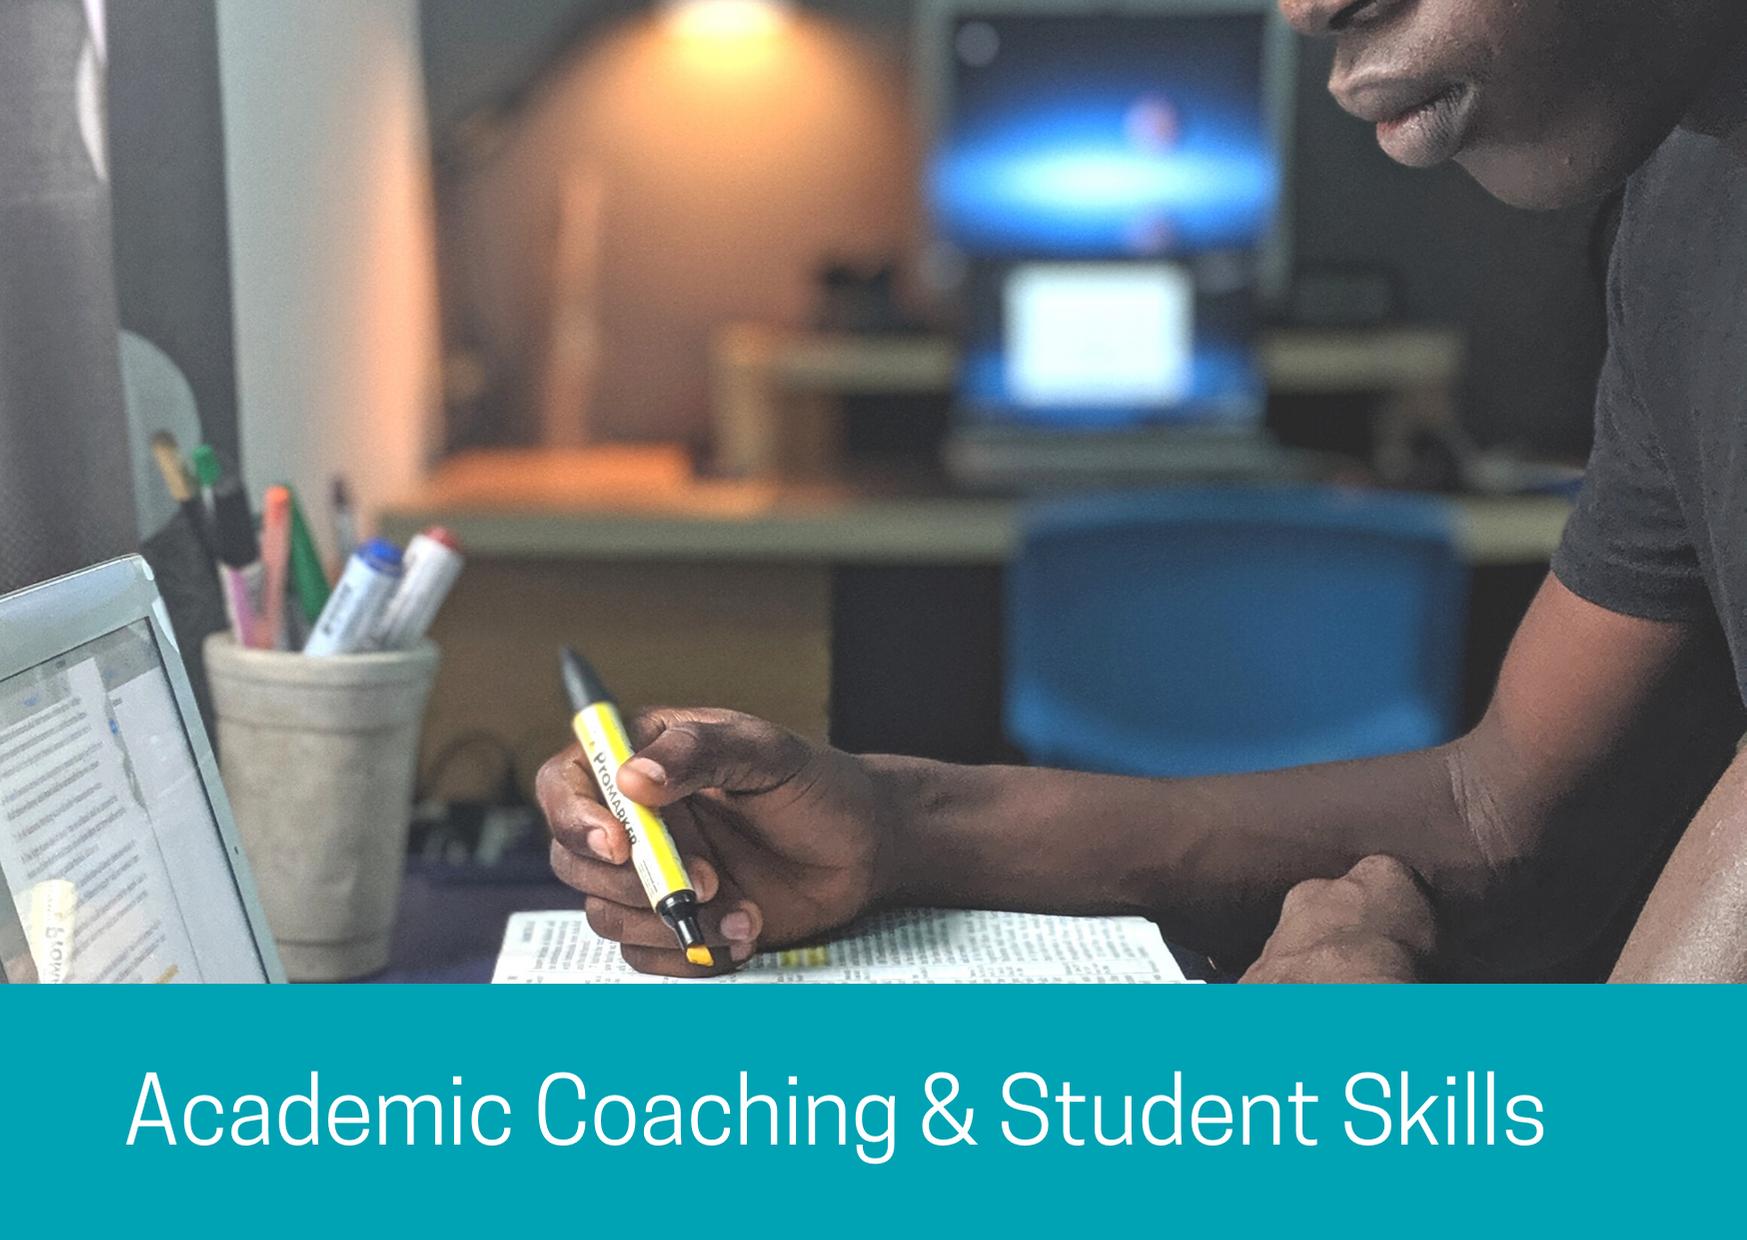 Academic Coaching and Student Skills